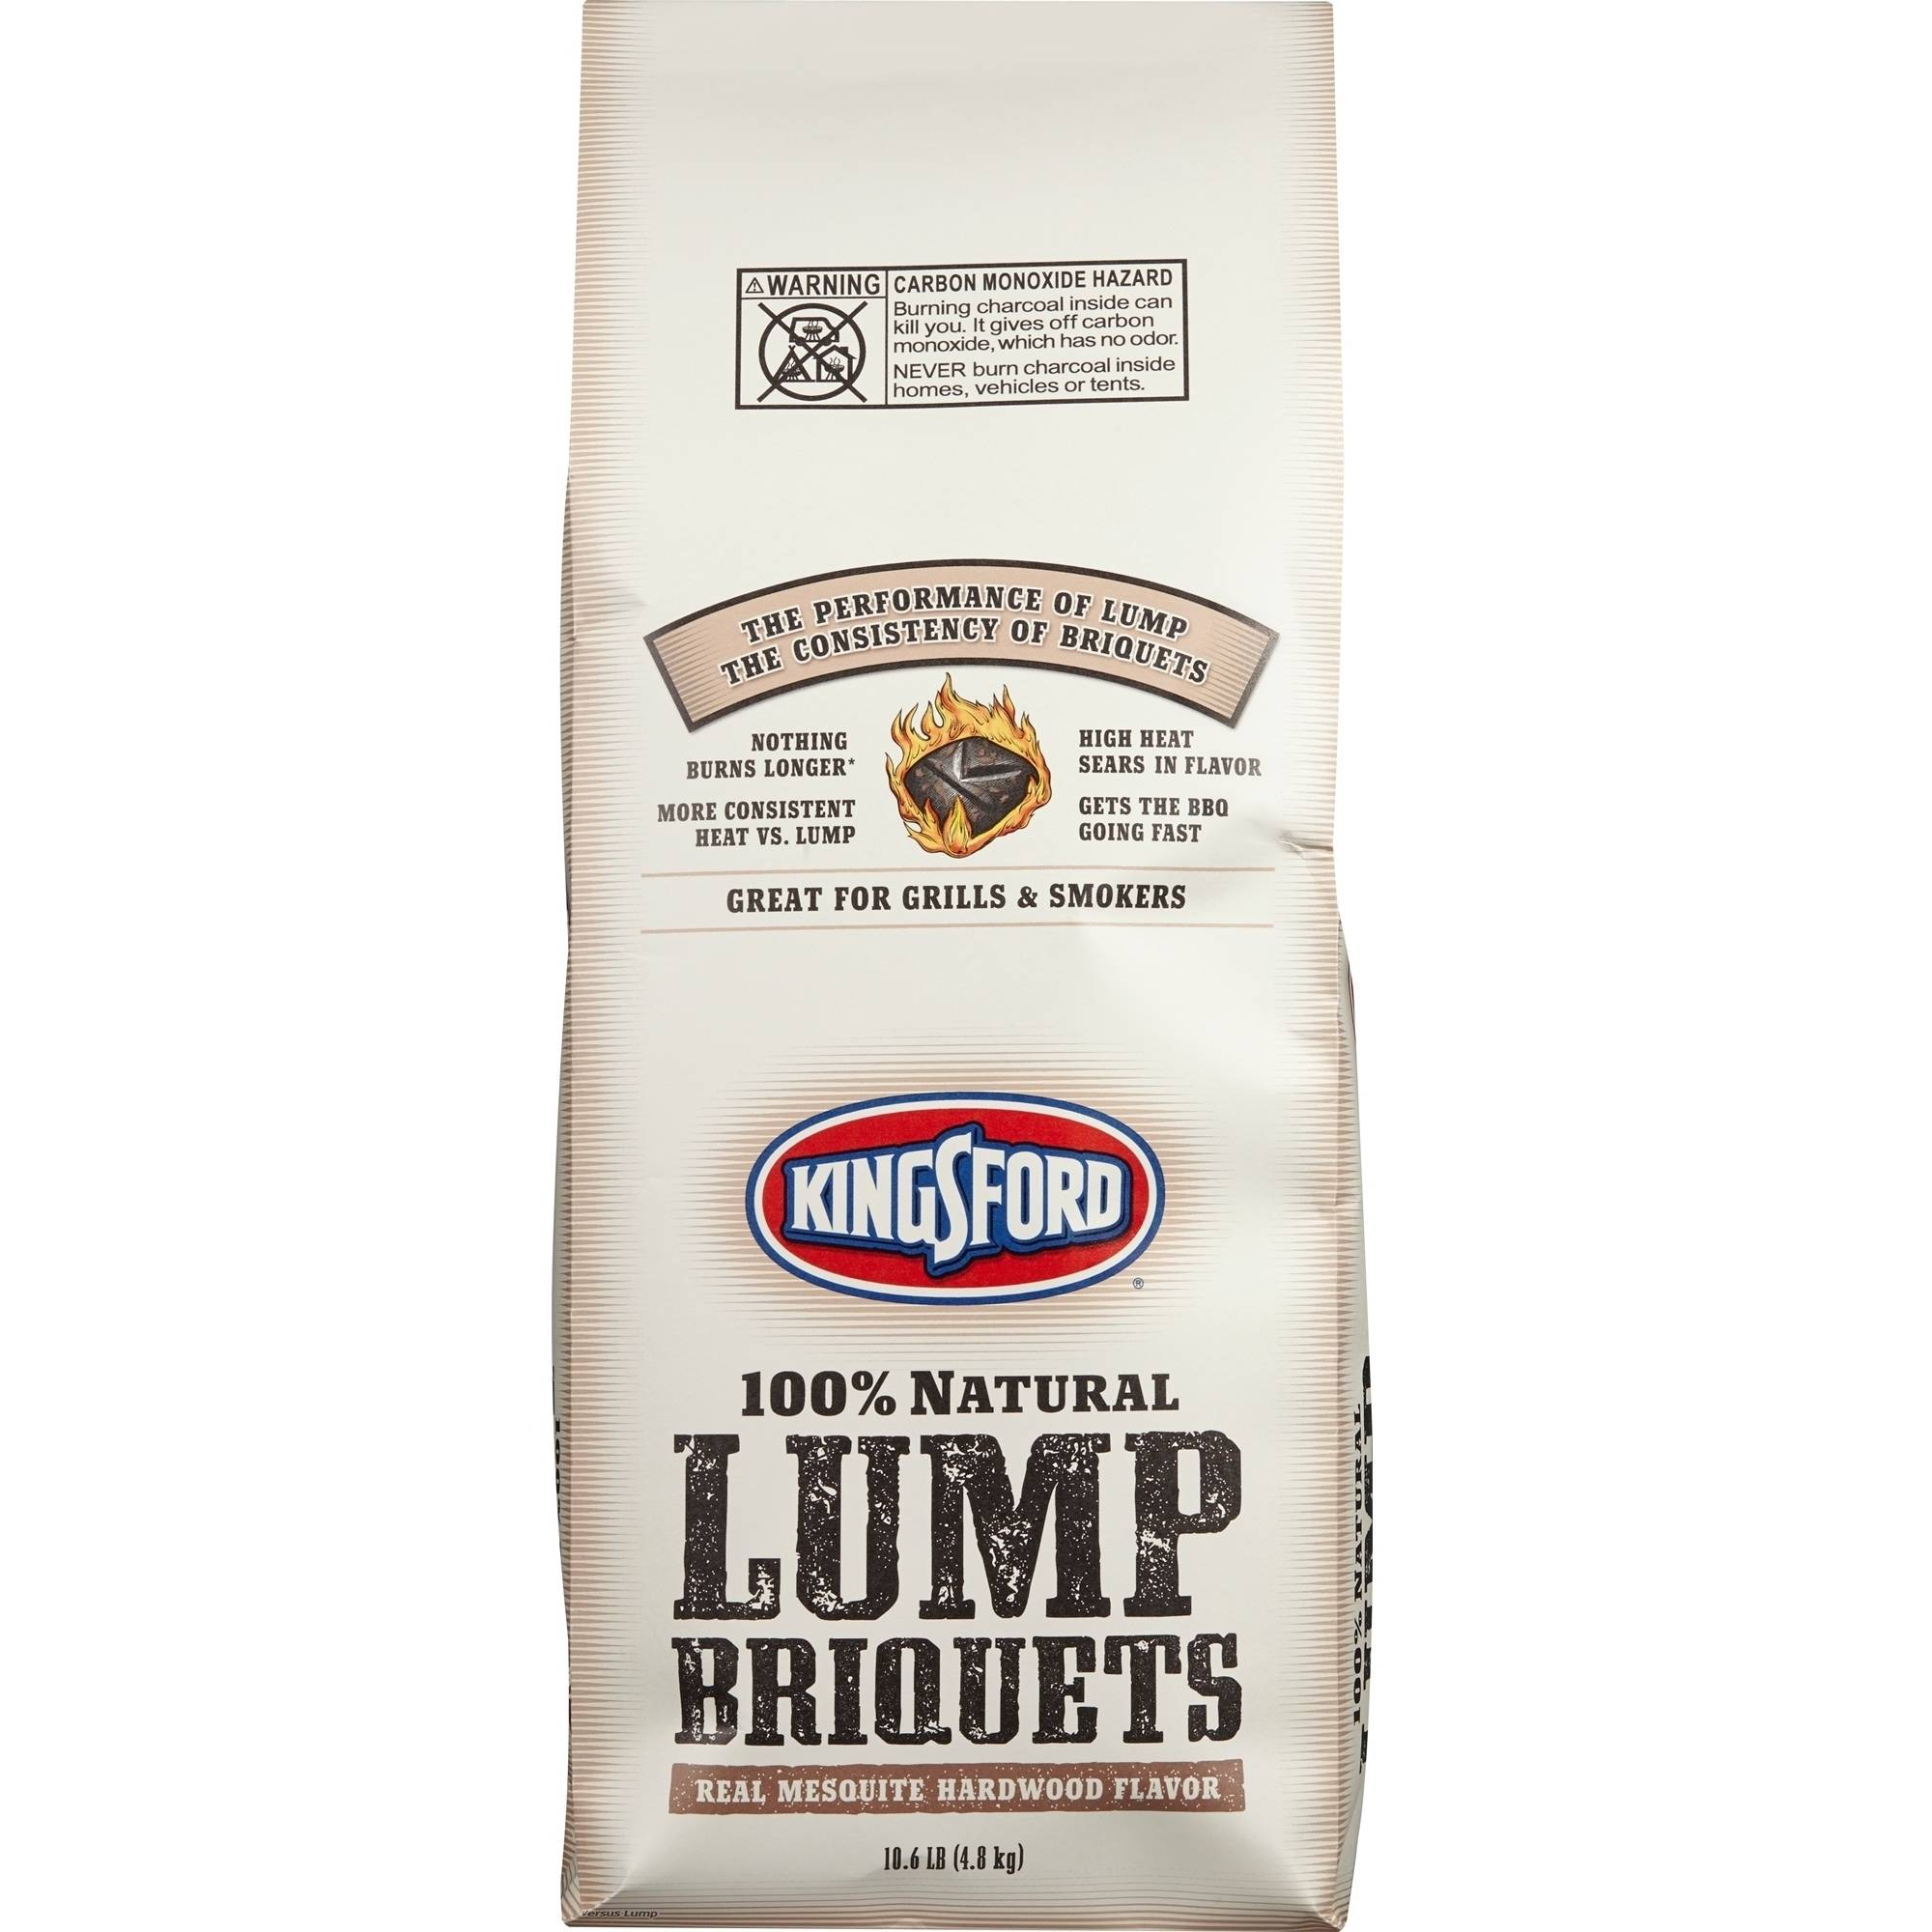 Kingsford Lump Charcoal Briquets, Mesquite Hardwood Flavor, 10.6 lb Bag